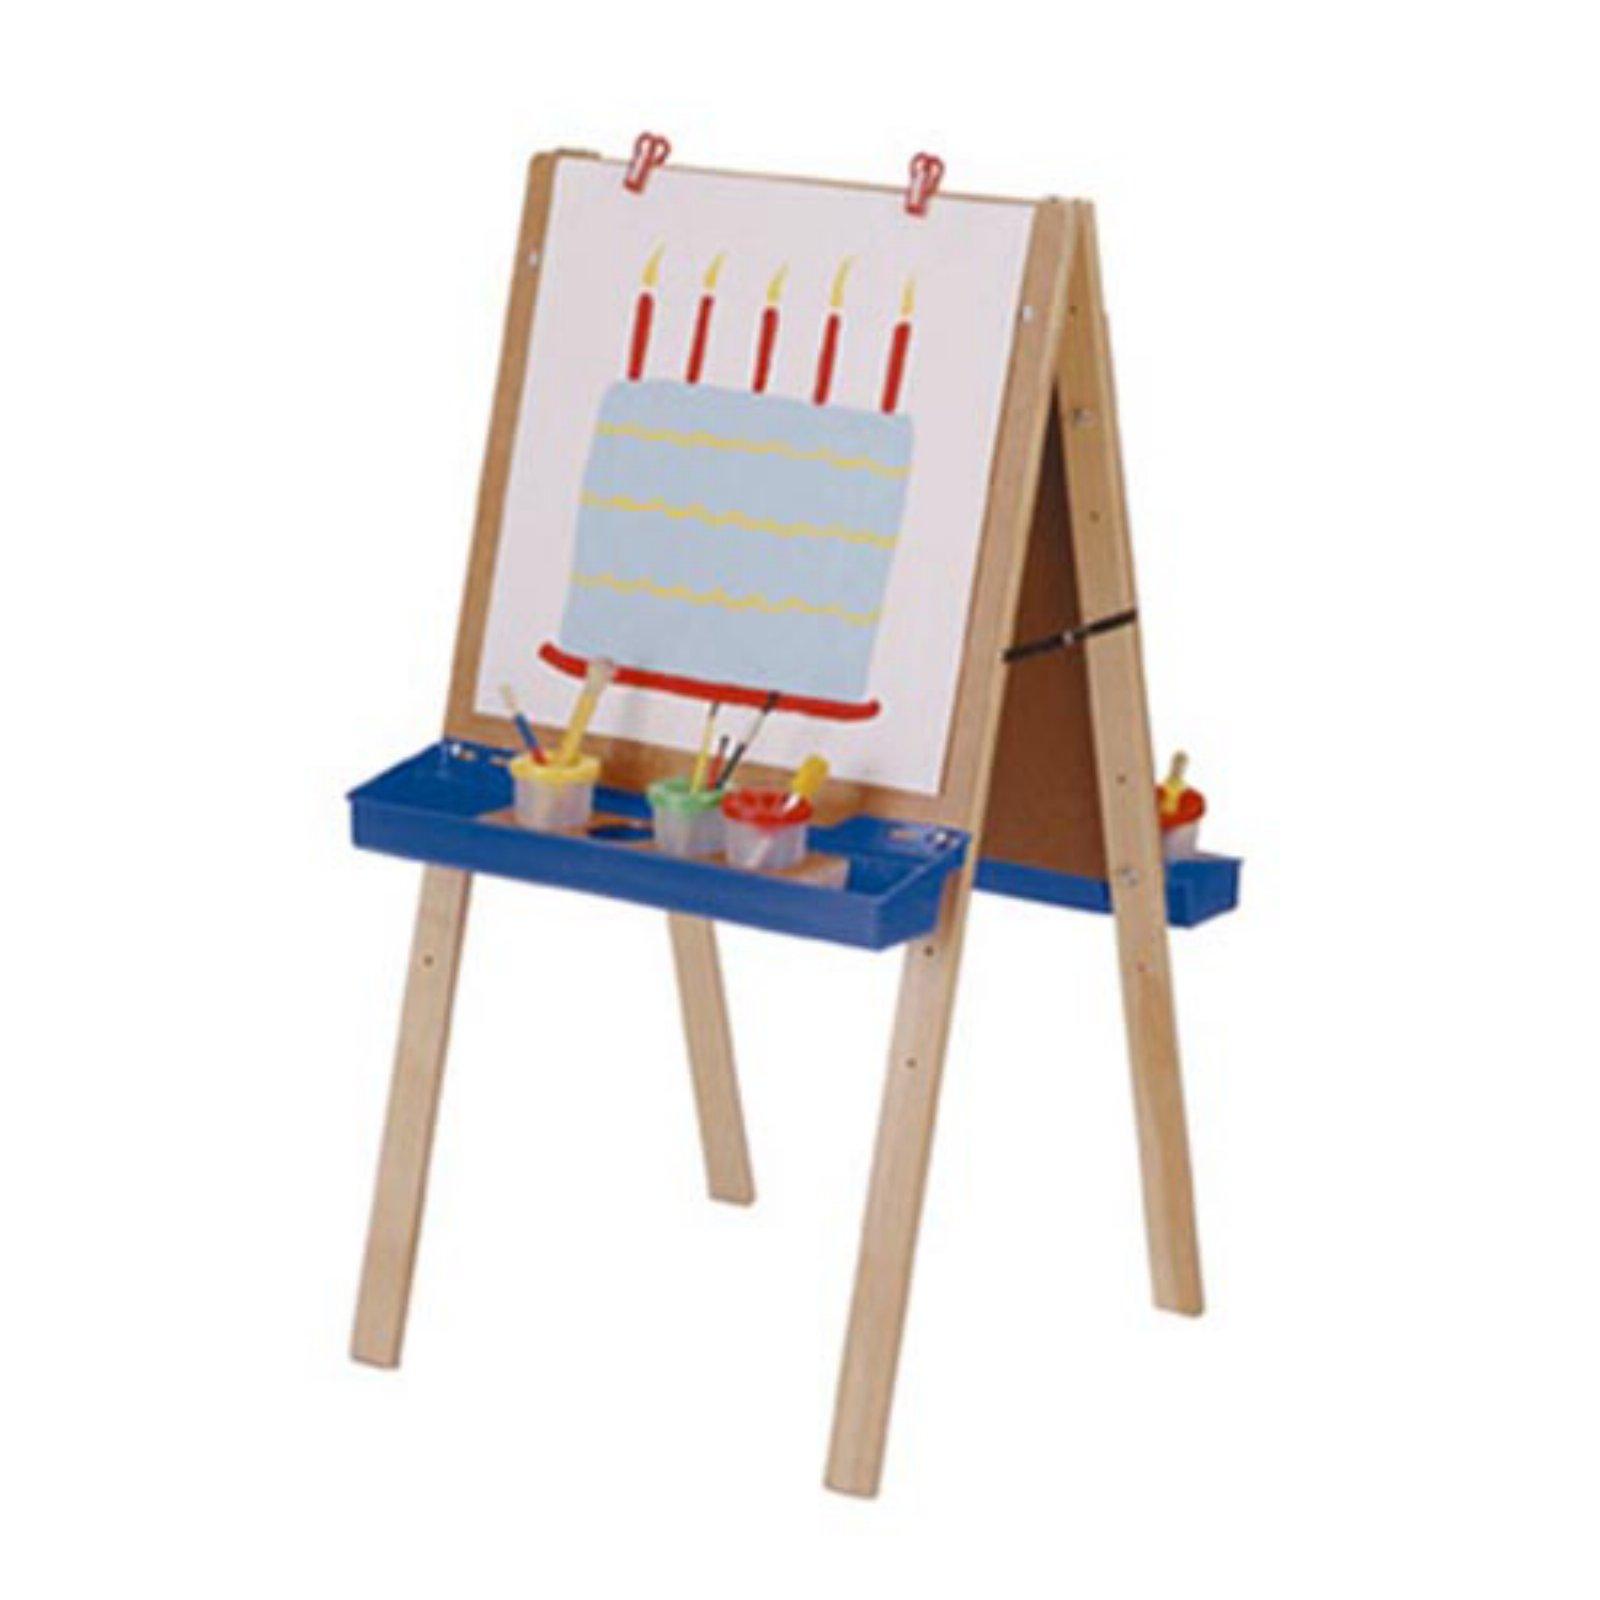 Jonti-Craft Primary Adjustable Childrens Easel